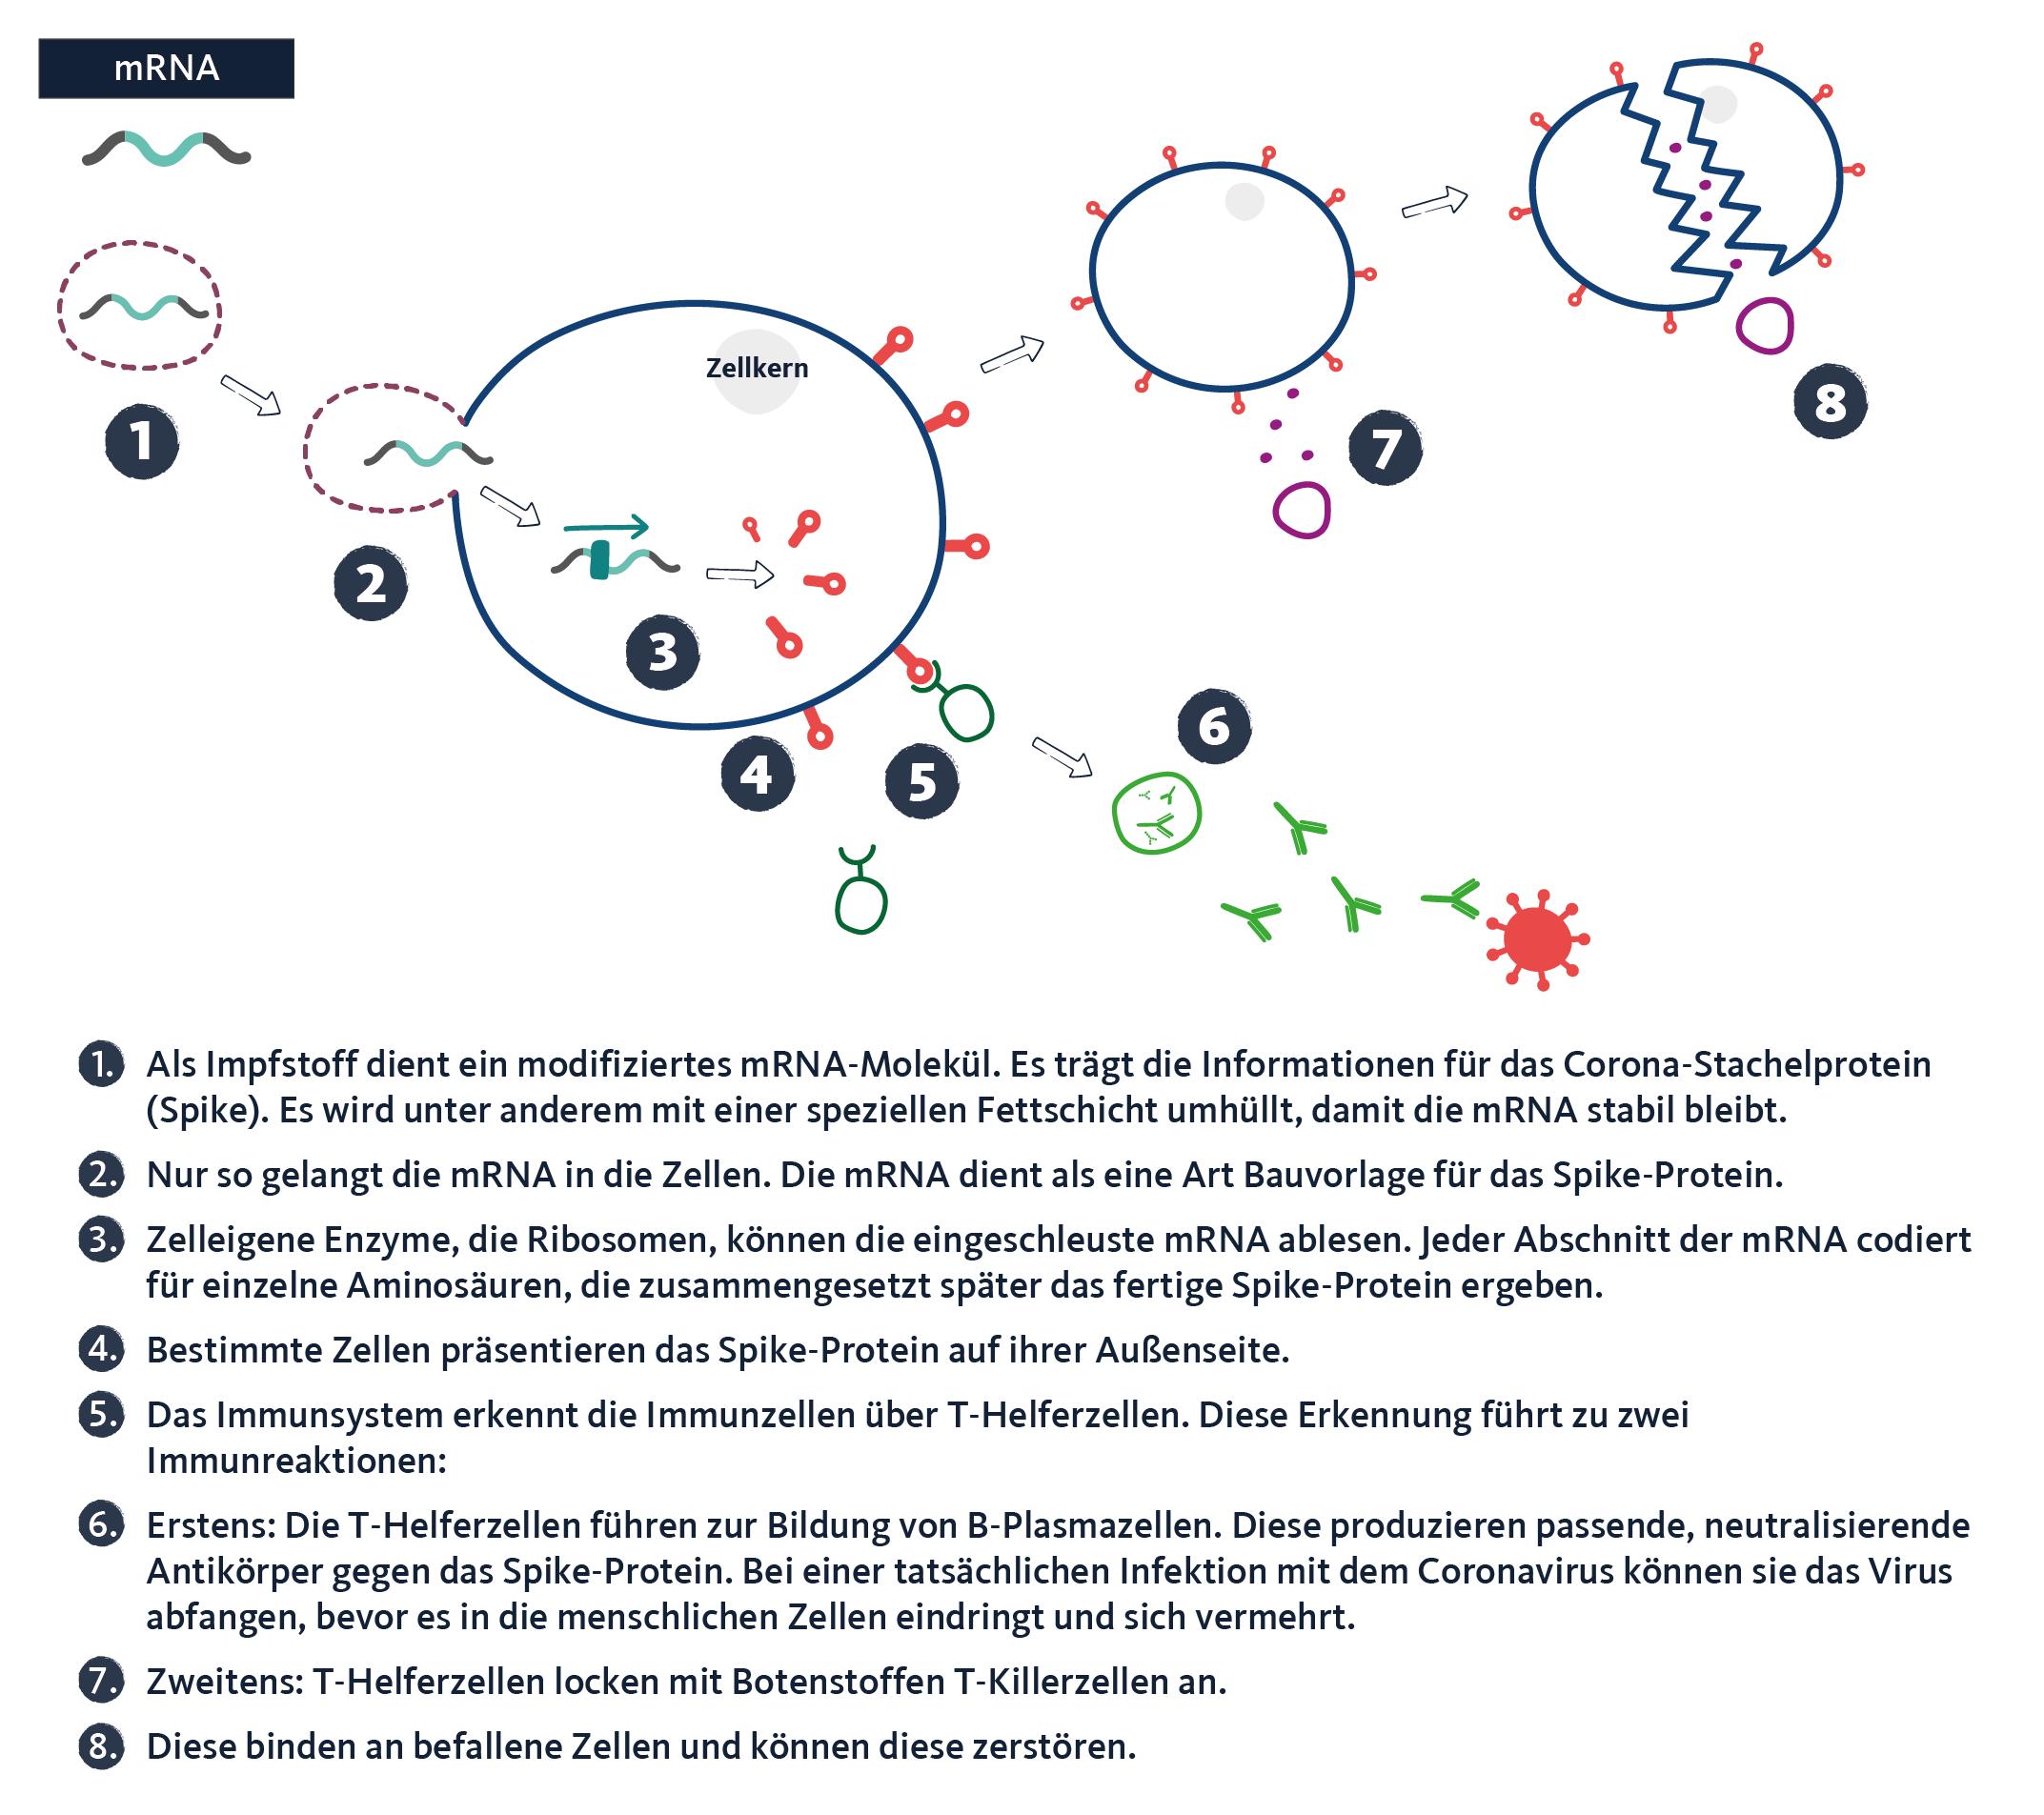 Grafik: So funktionieren mRNA-Impfstoffe. WDR/quarks